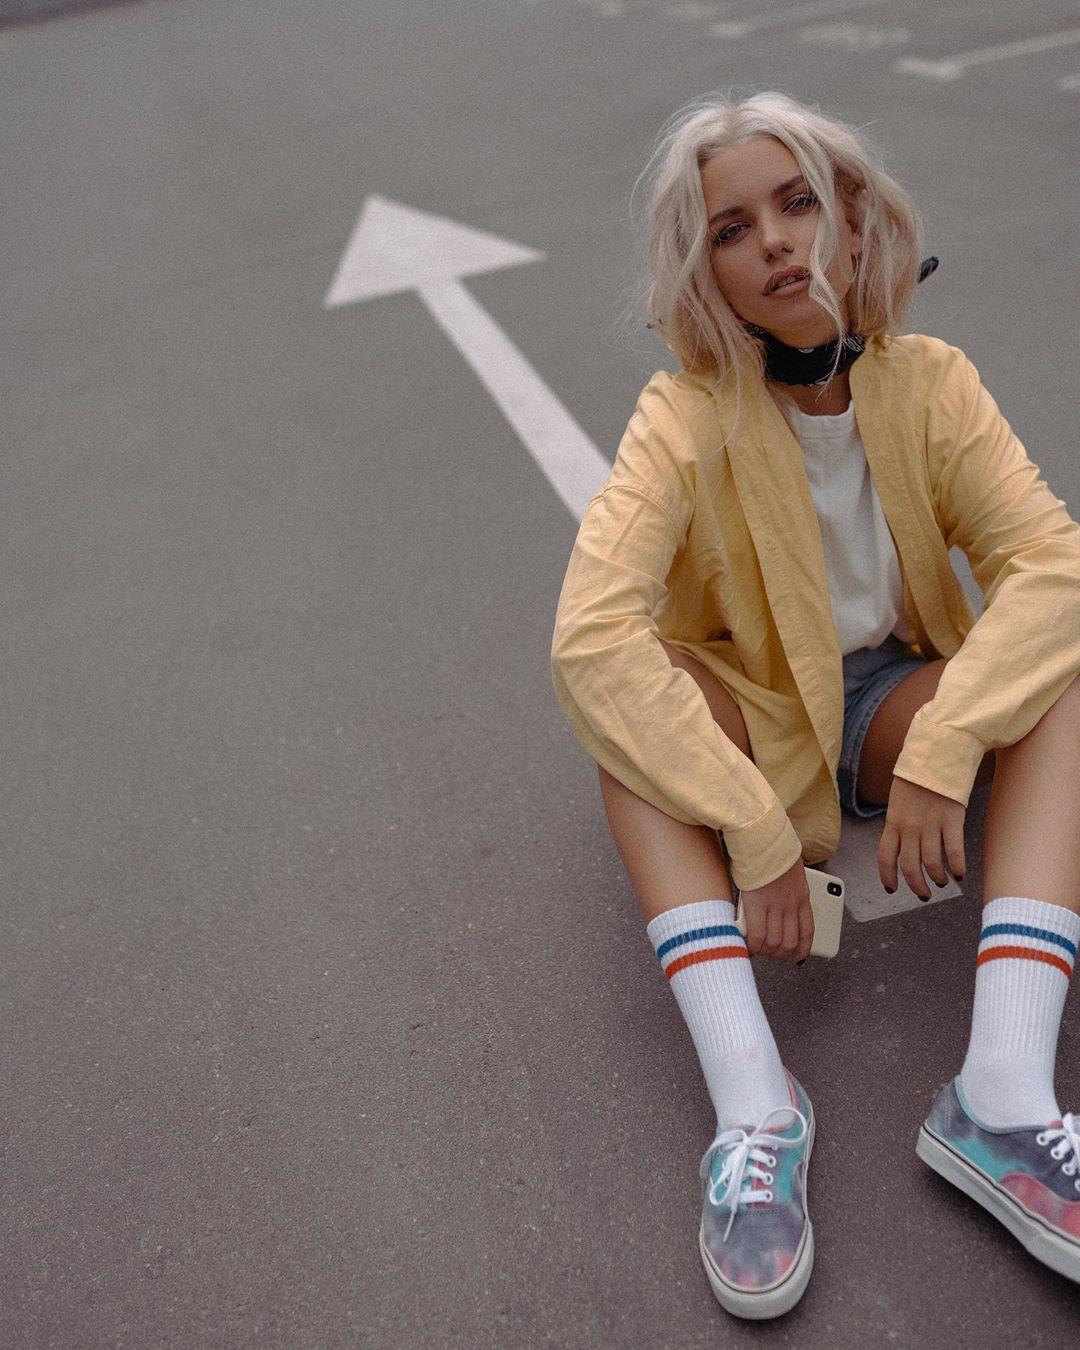 Alexandra-Burimova-Wallpapers-Insta-Fit-BIo-11